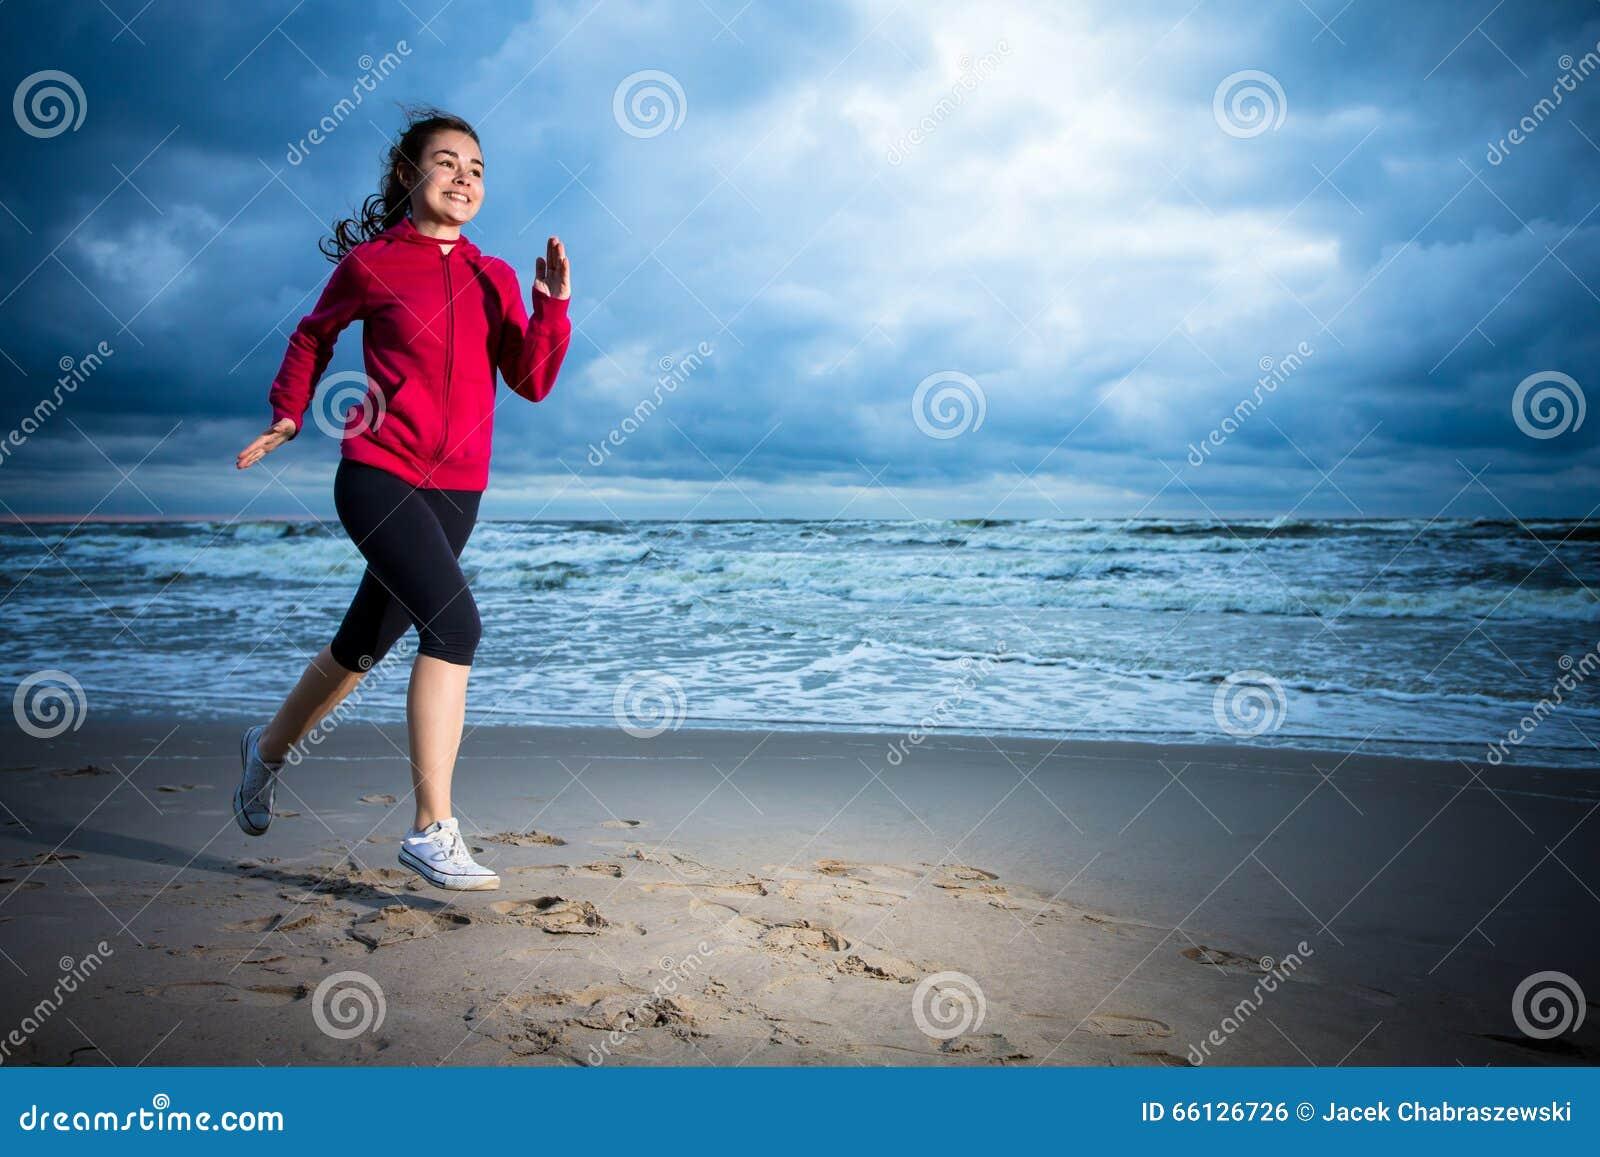 Girl Running On Beach Stock Photo - Image: 66126726 Girl Running On Beach